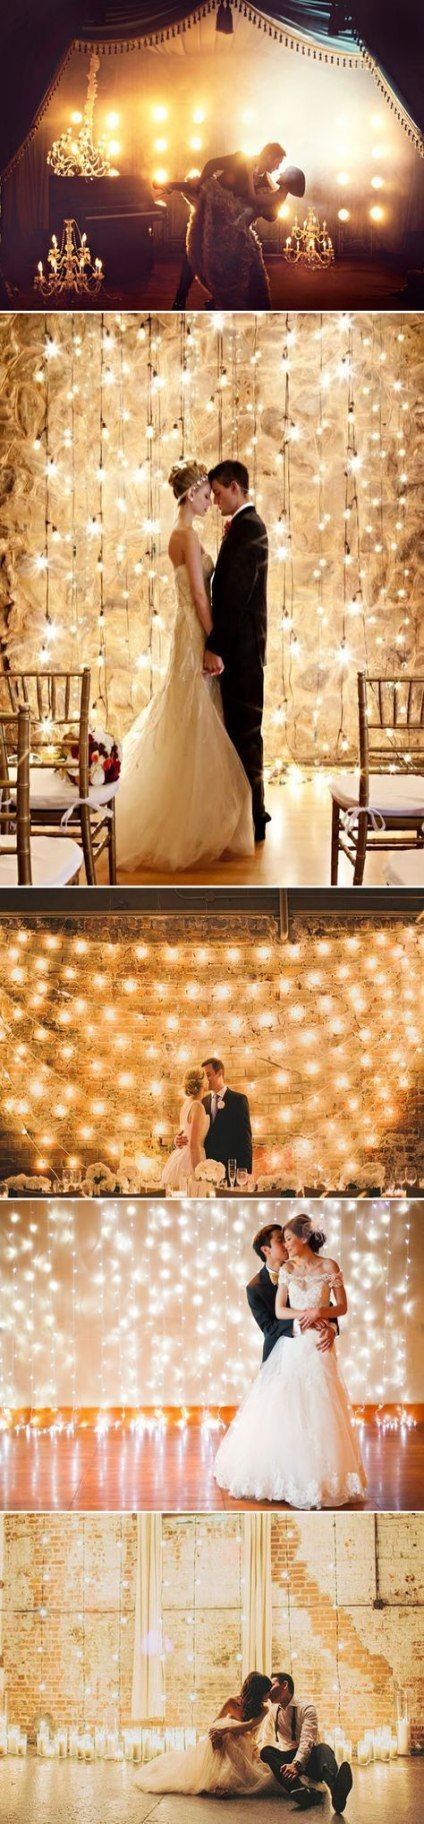 20+ Ideas wedding photos creative lighting Photo